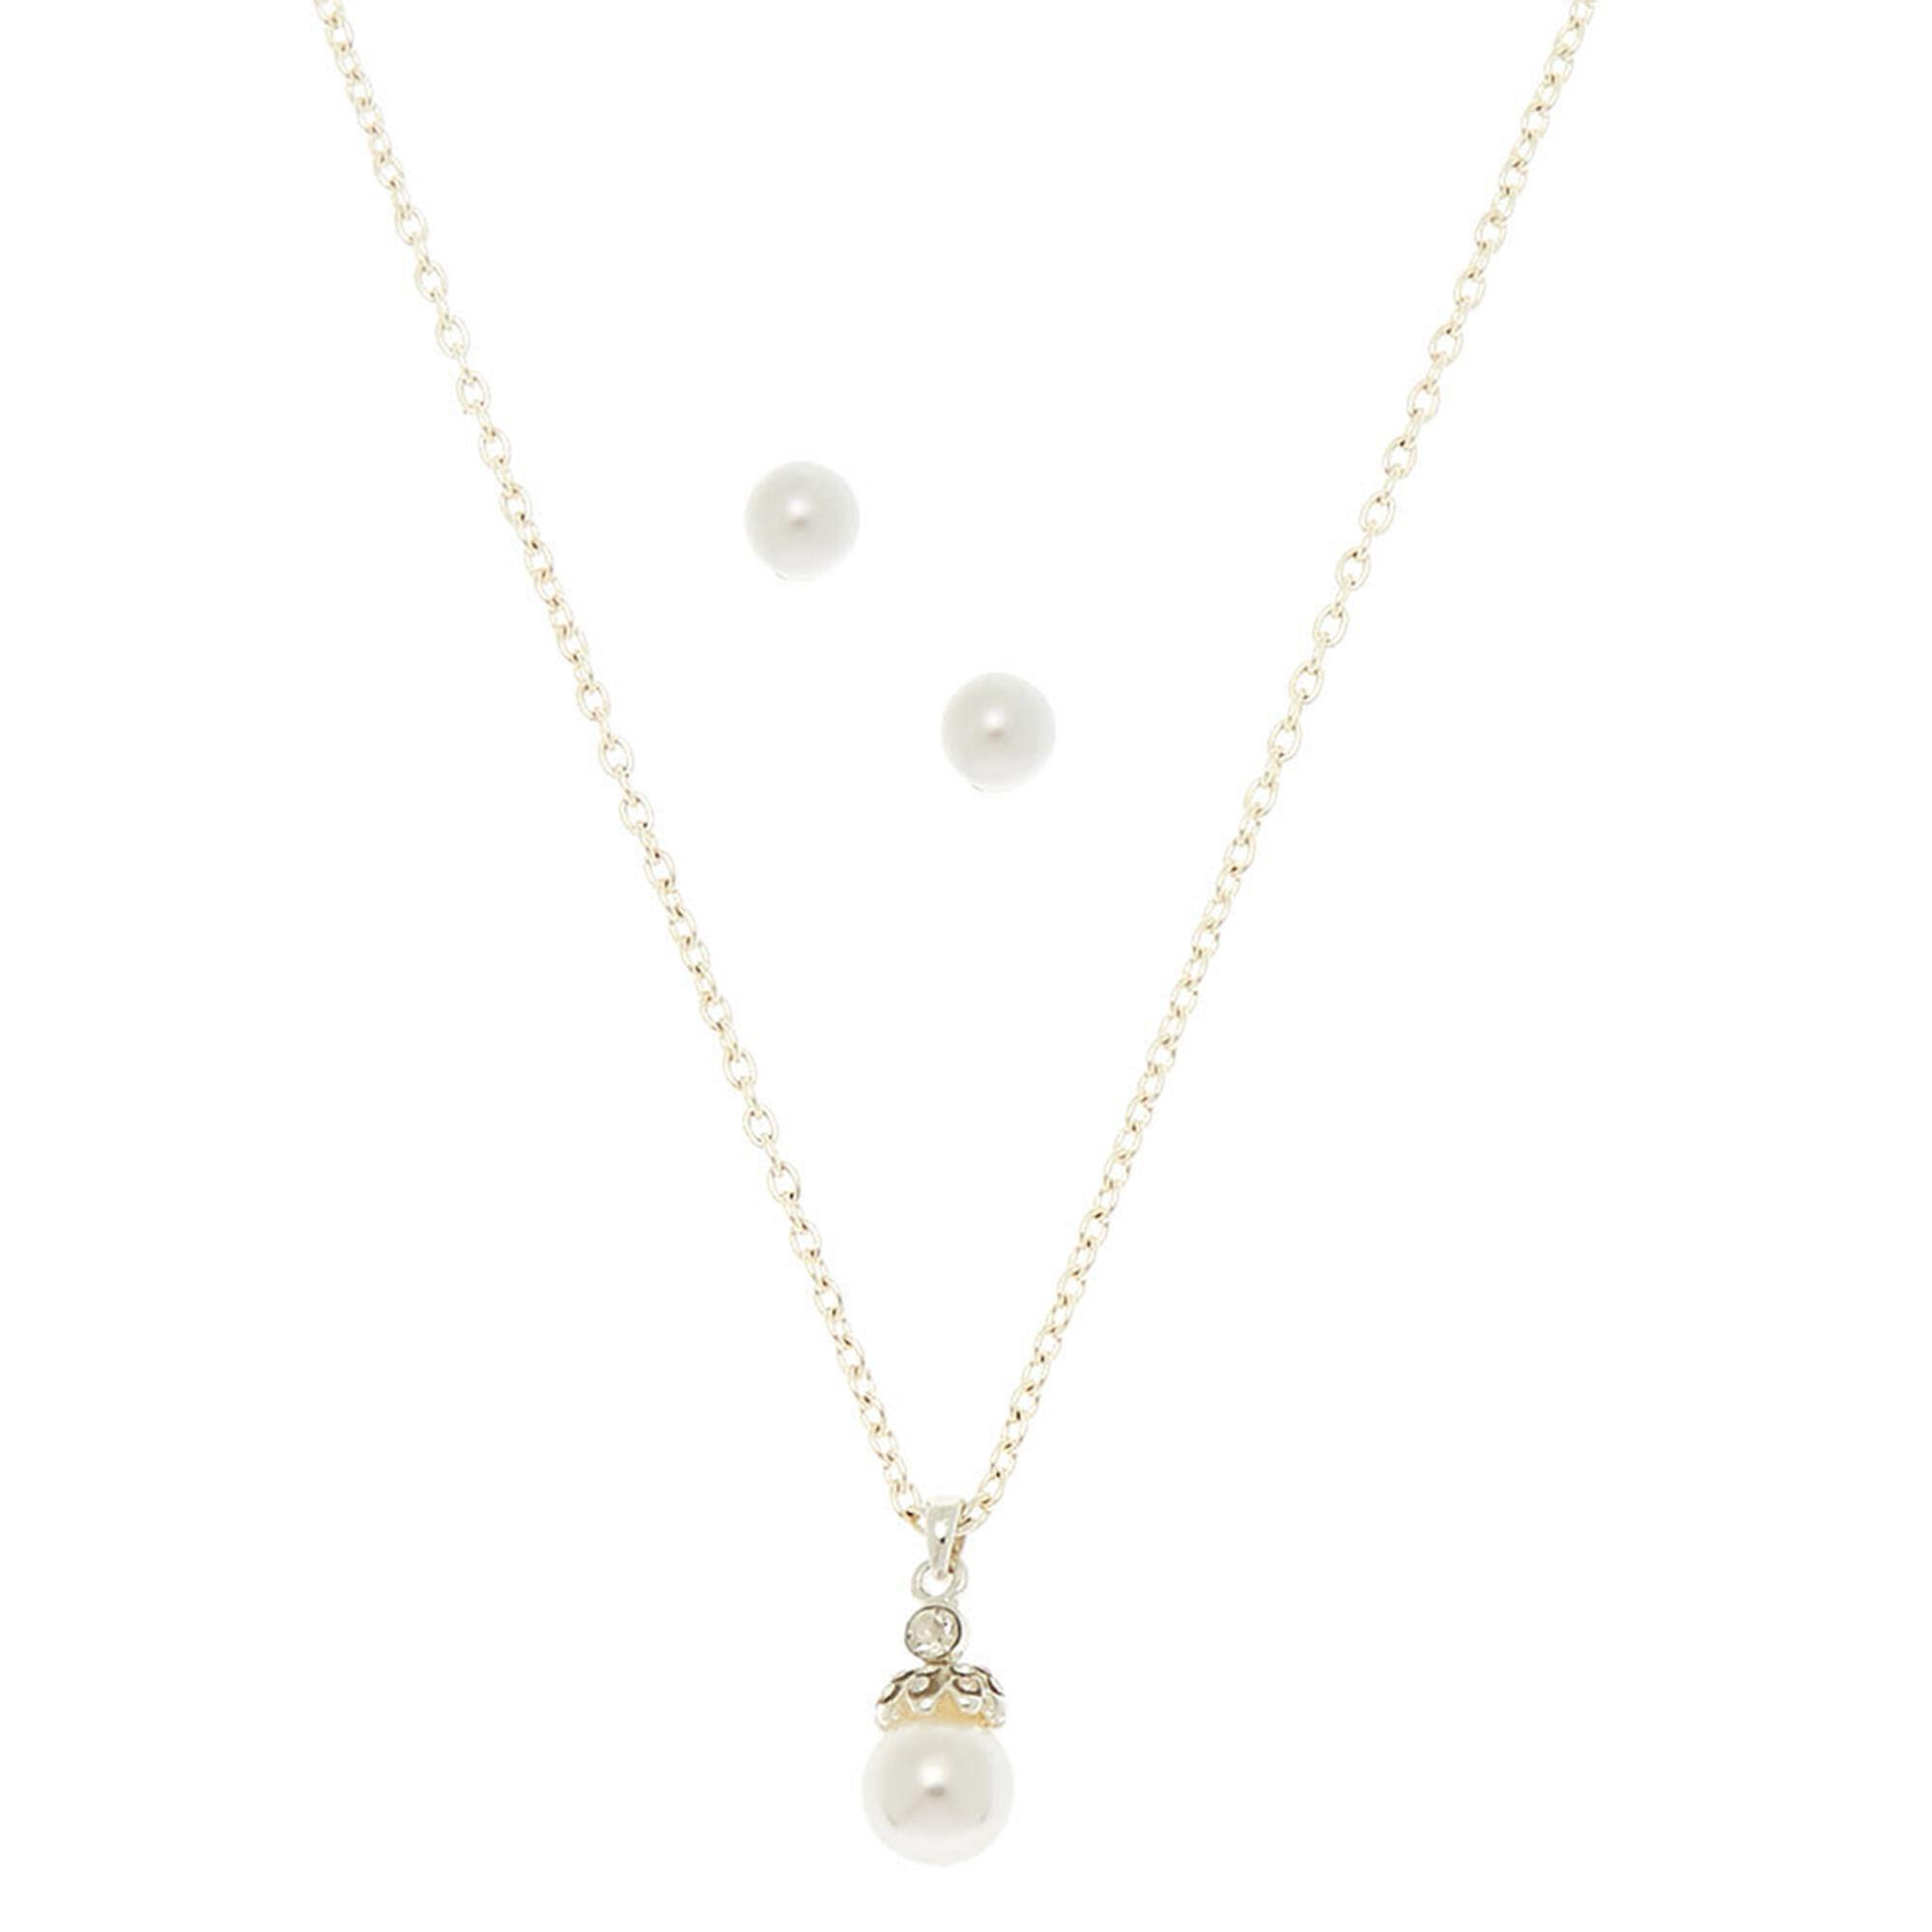 ef76c1ea15178 Elegant Pearl Jewelry Set - 2 Pack